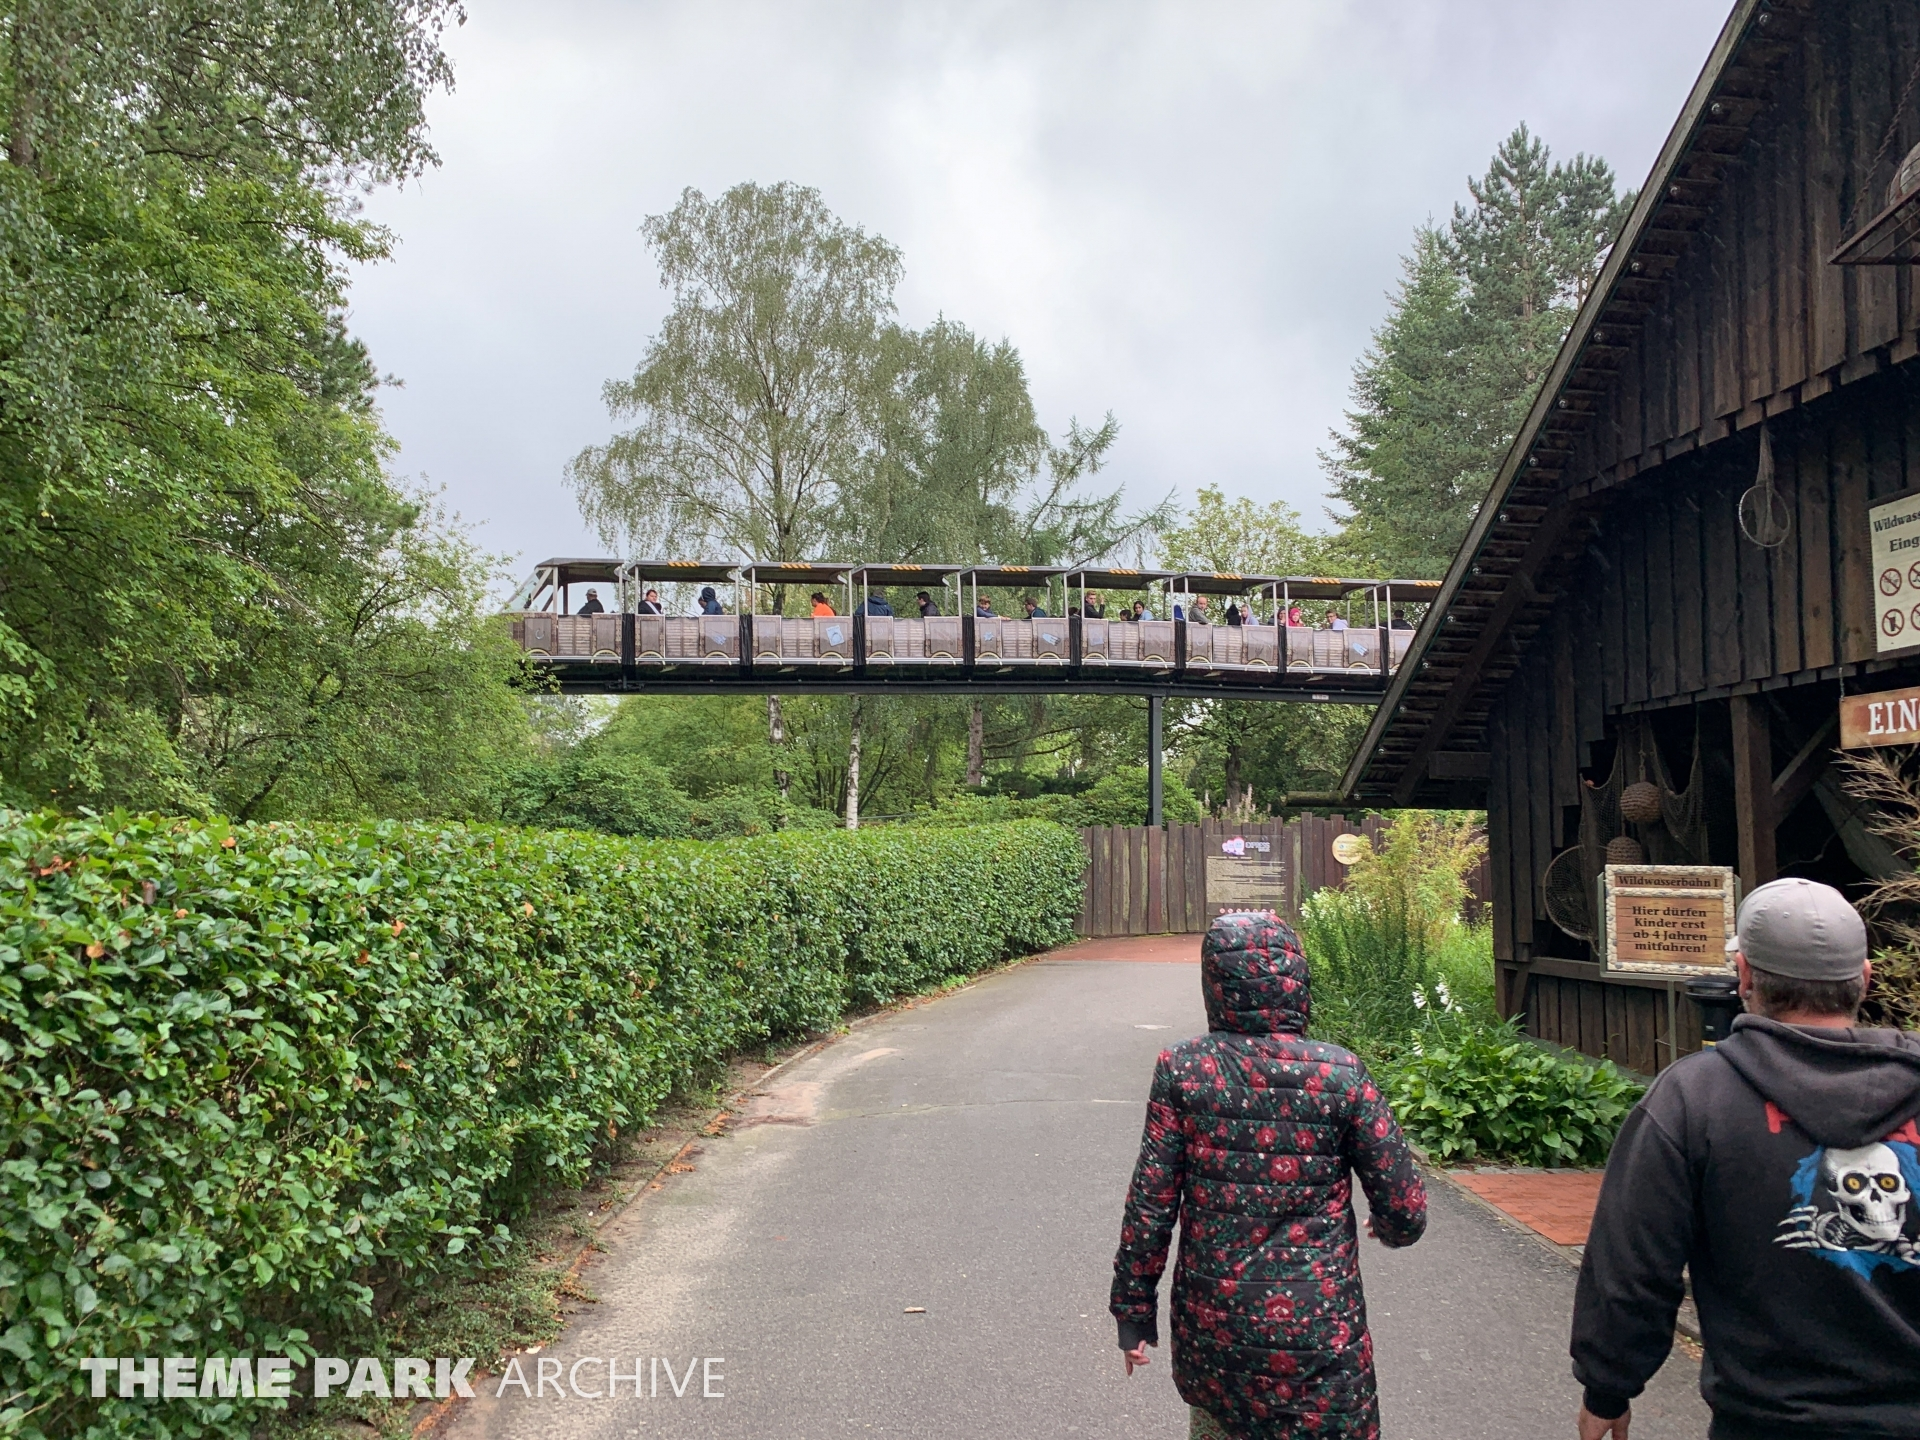 Panoramabahn at Heide Park